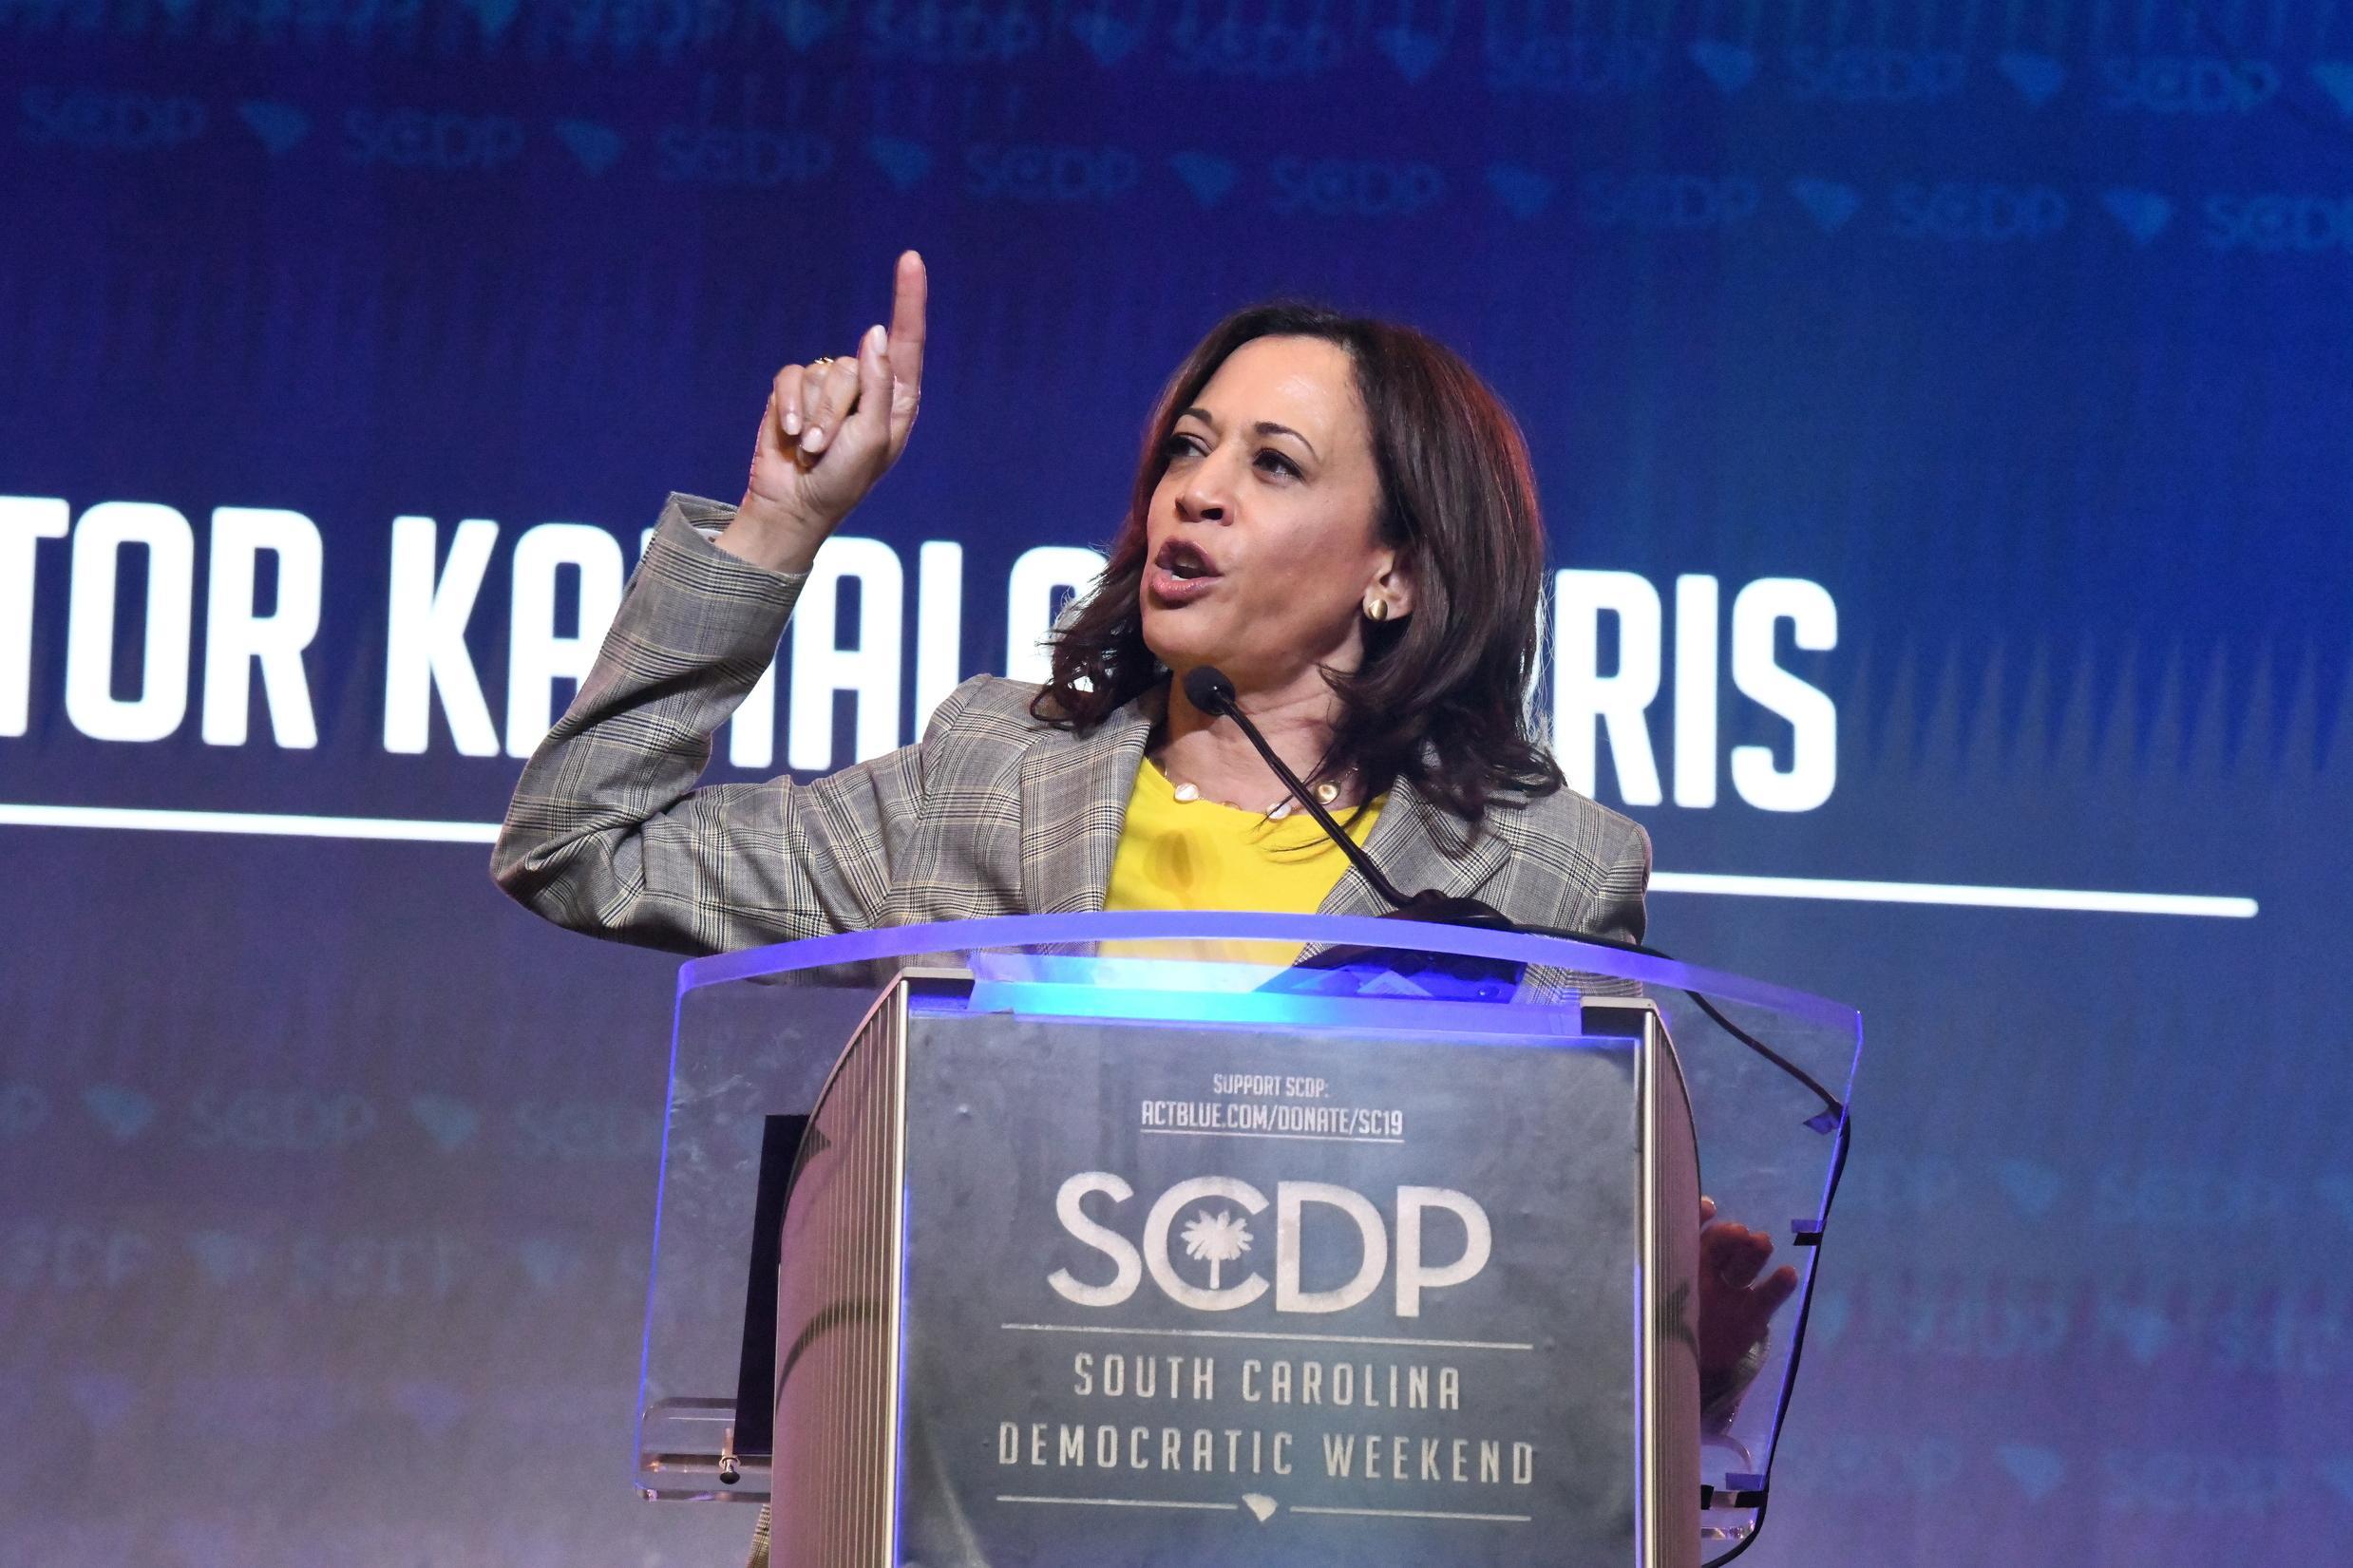 Sen. Kamala Harris wins endorsement from Rep. William Lacy Clay